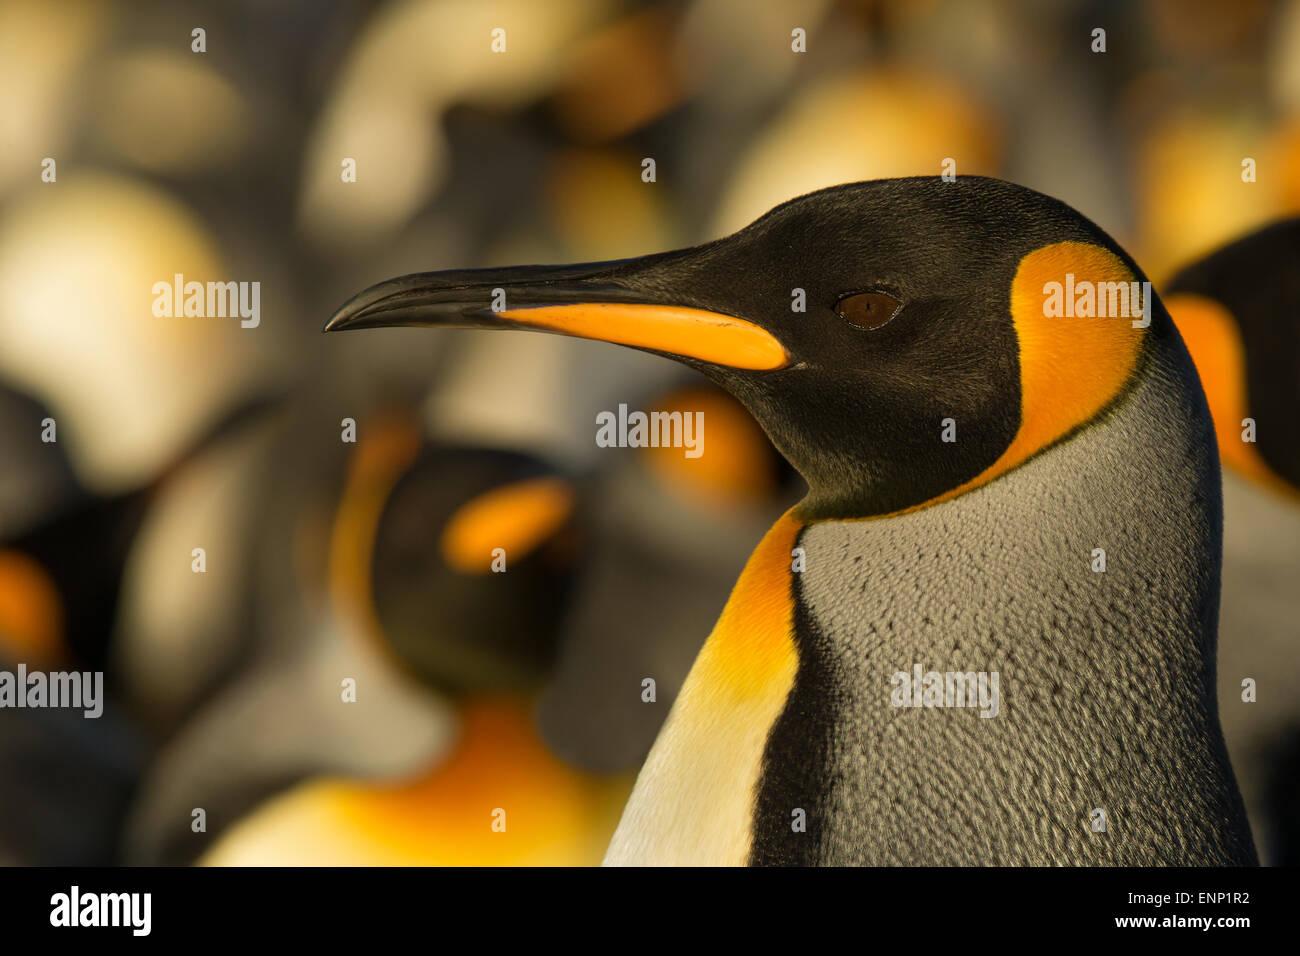 Close-up of adult King penguin, Falkland islands - Stock Image